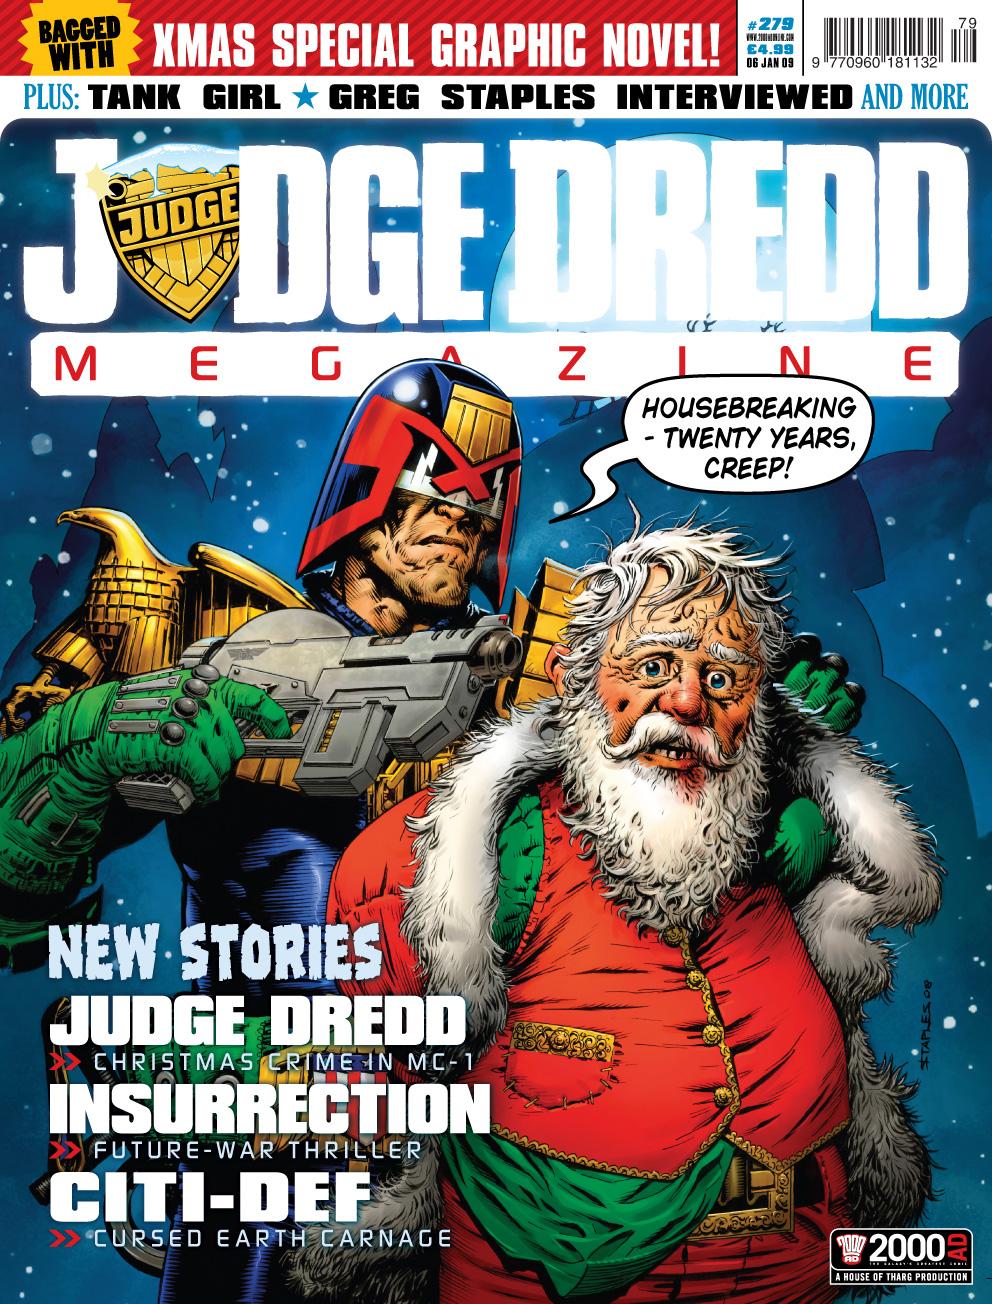 Figure 20 Judge Dredd Megazine 279 6 January 2009